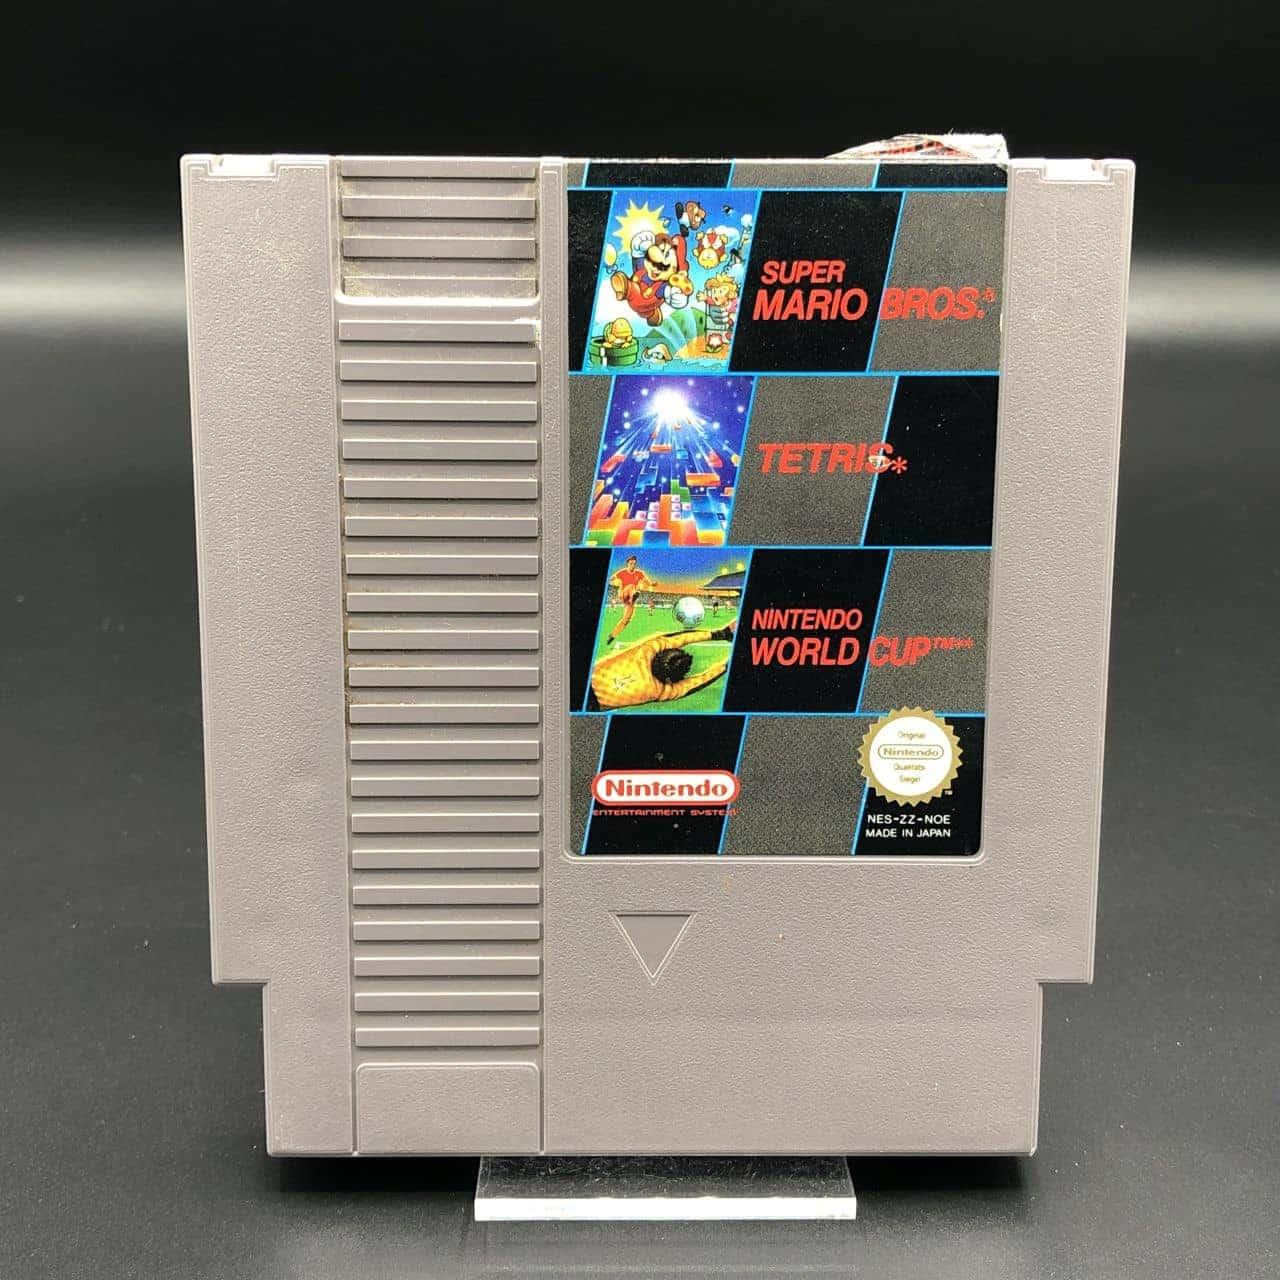 NES Super Mario Bros., Tetris, Nintendo World Cup (Modul) (Gut) Nintendo Entertainment System